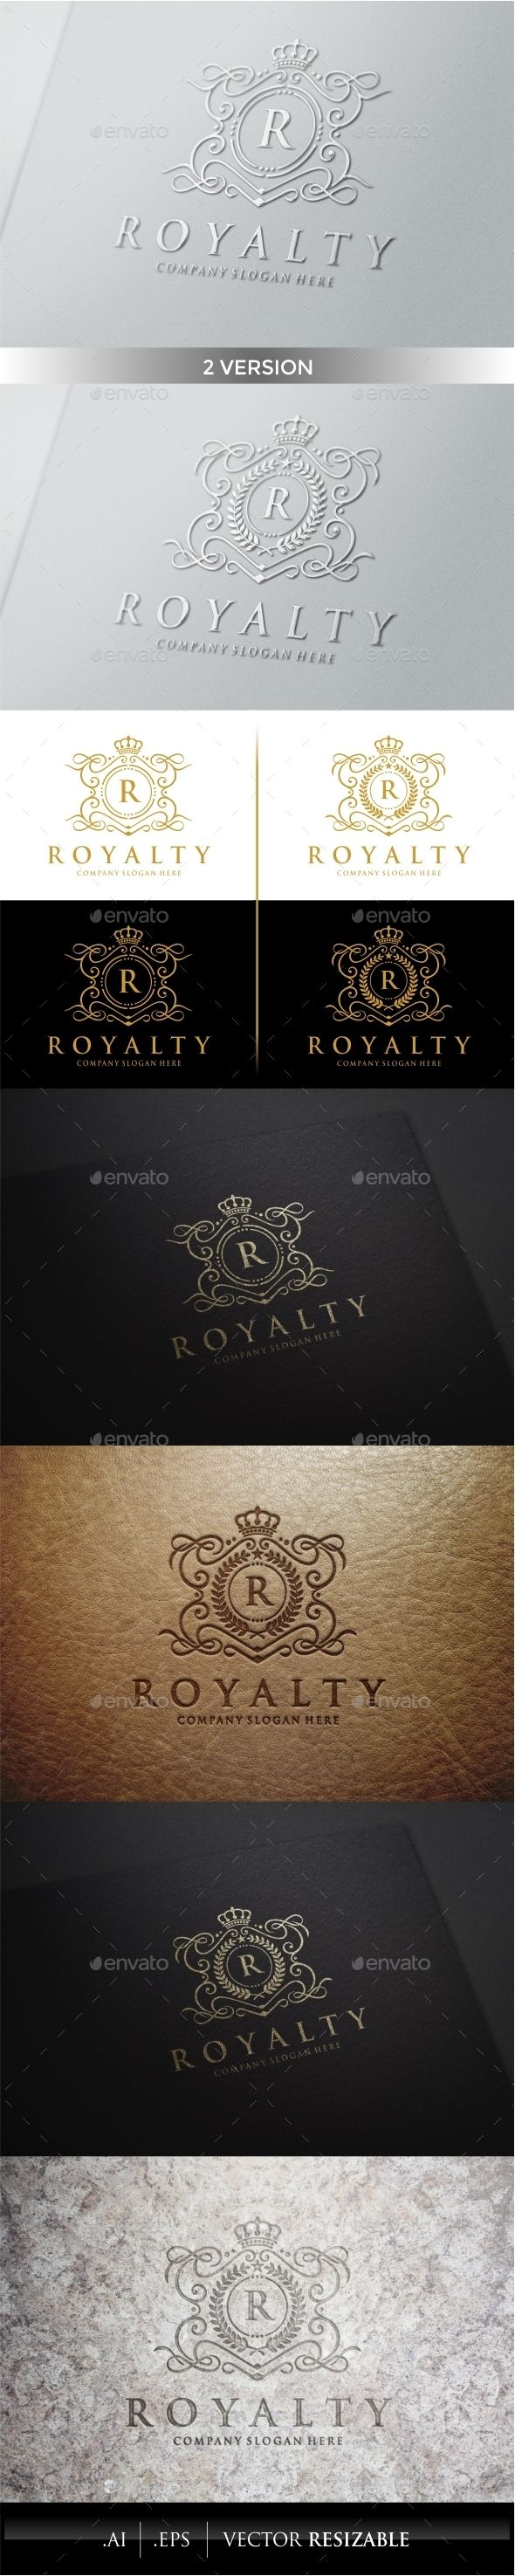 Royalty Logo Template #design #logodesign #logotype Download: http://graphicriver.net/item/royalty-logo-template/9937190?ref=ksioks